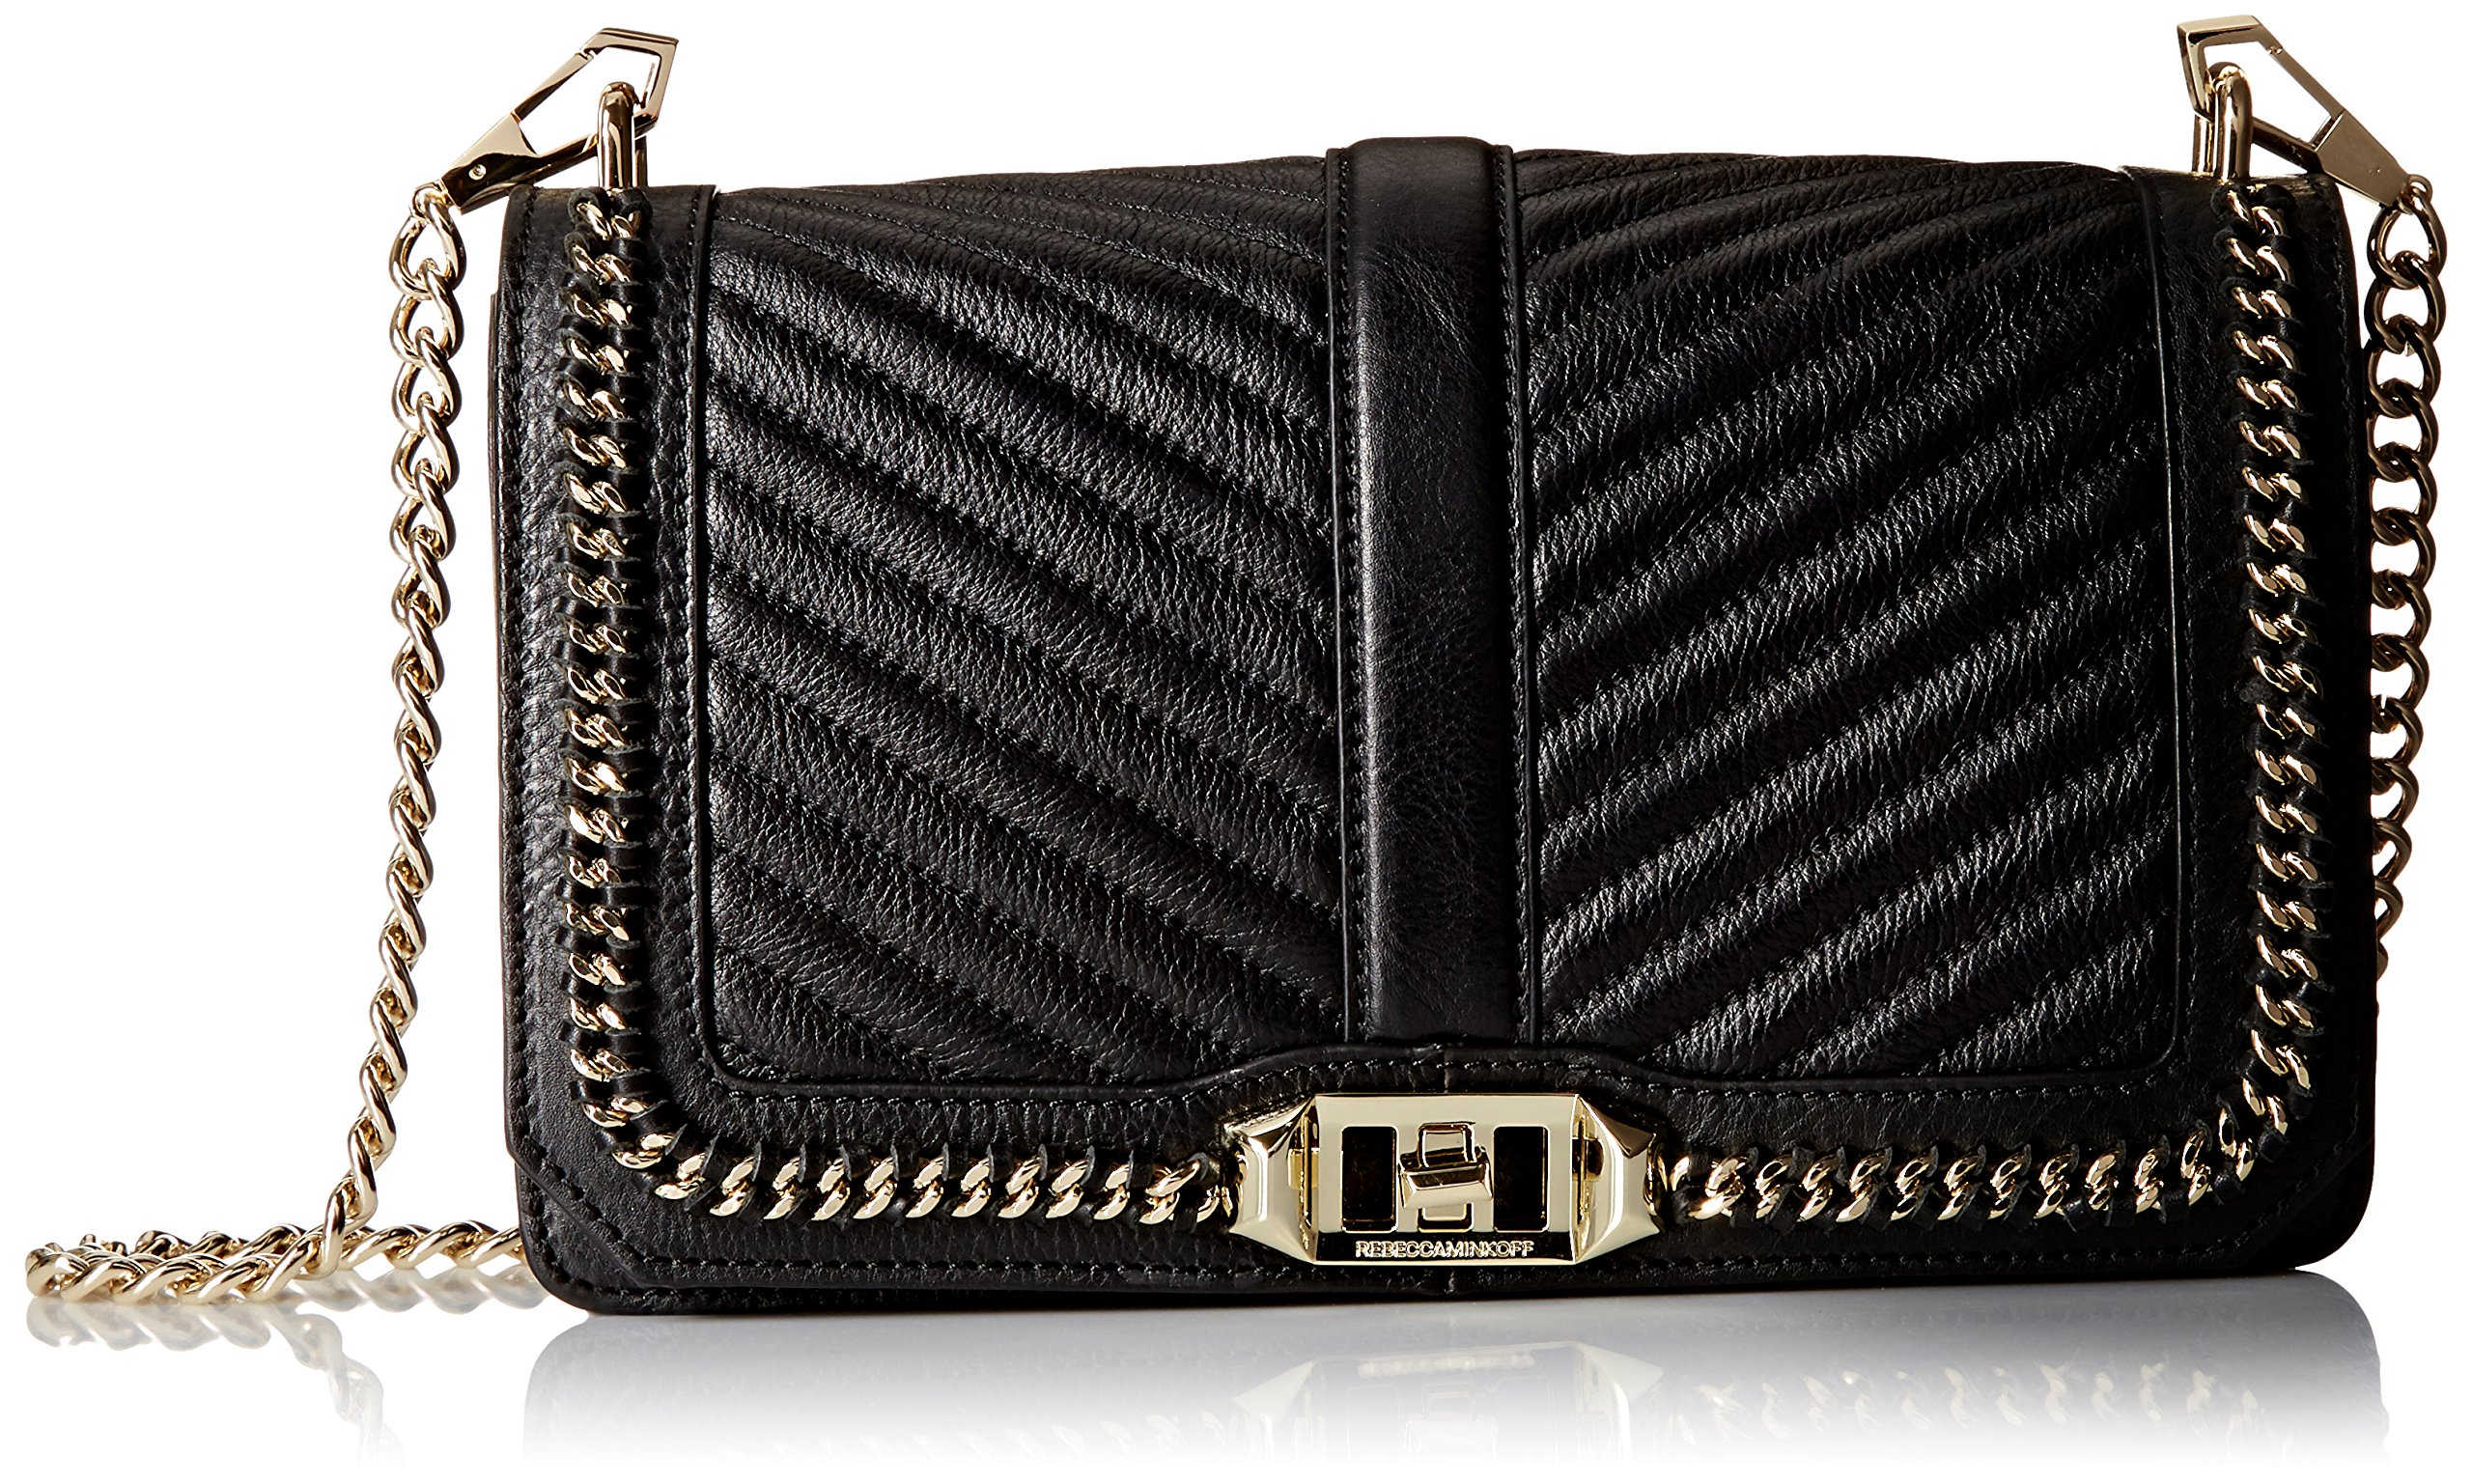 Rebecca Minkoff Love Crossbody Chevron Chain Shoulder Bag, Black, One Size